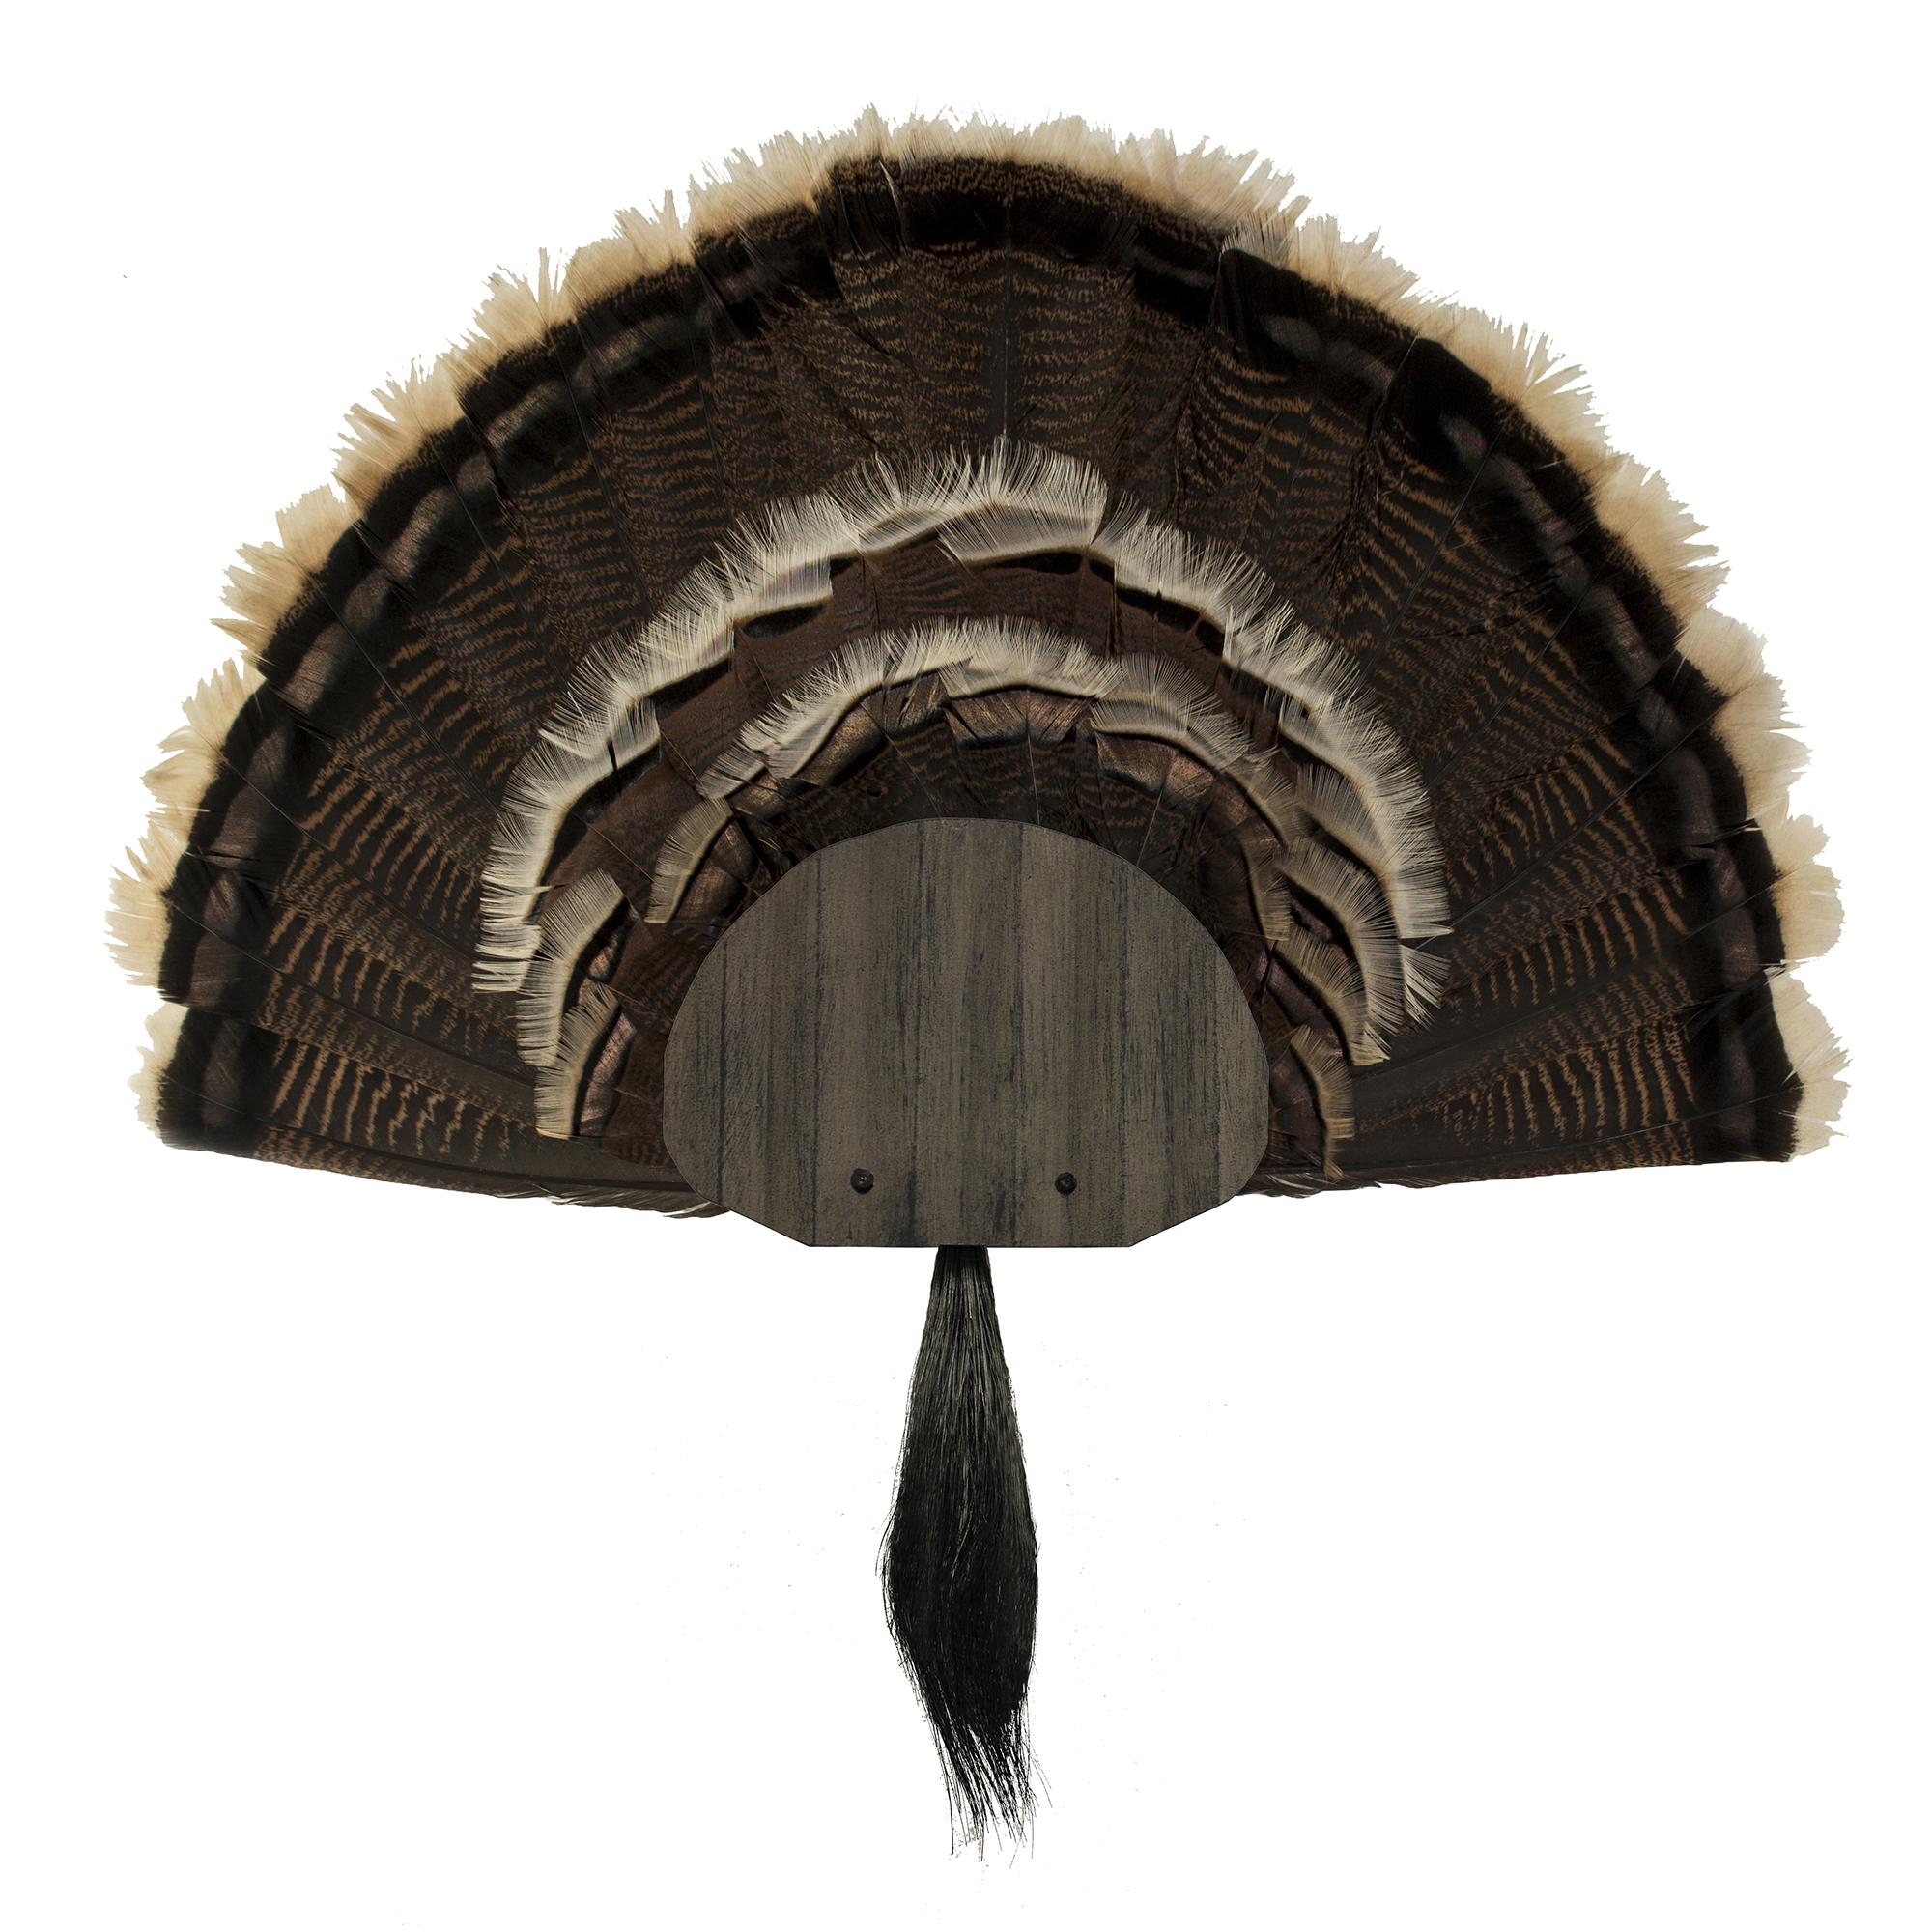 Walnut Hollow Metal Turkey Mounting Kit, Grey